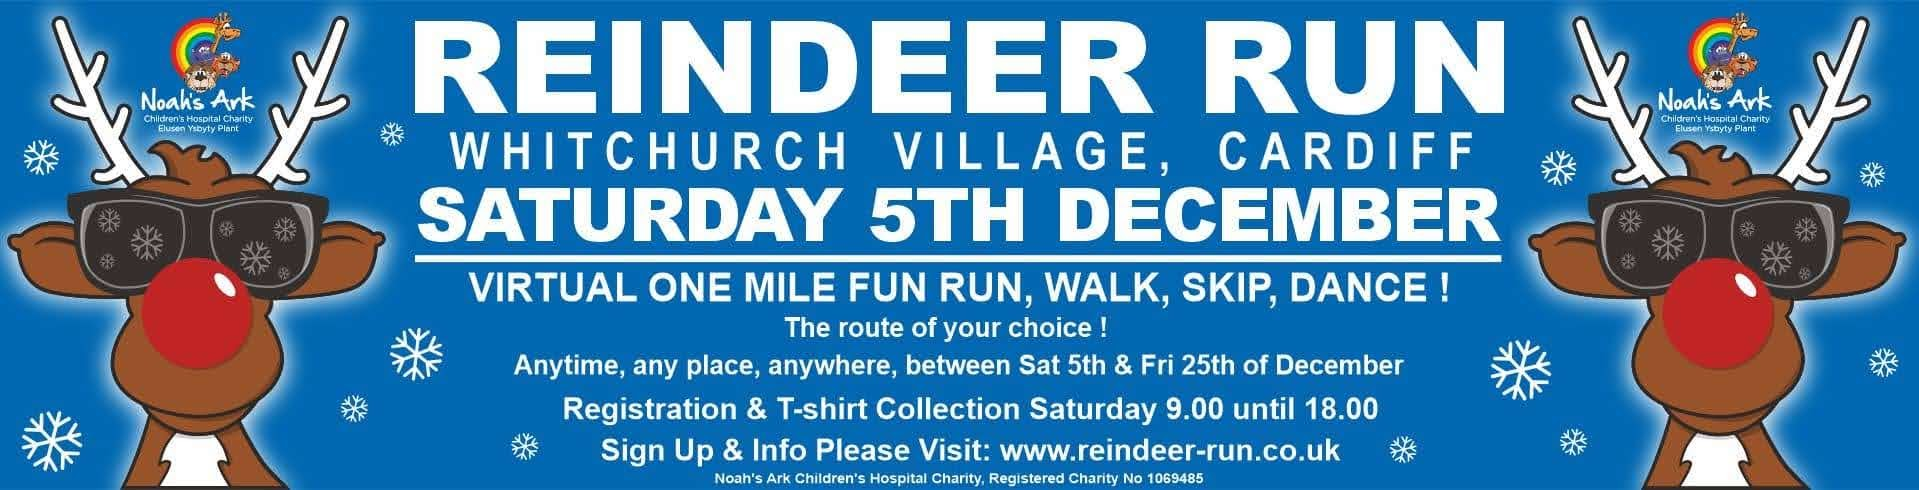 Whitchurch Reindeer Run 2020